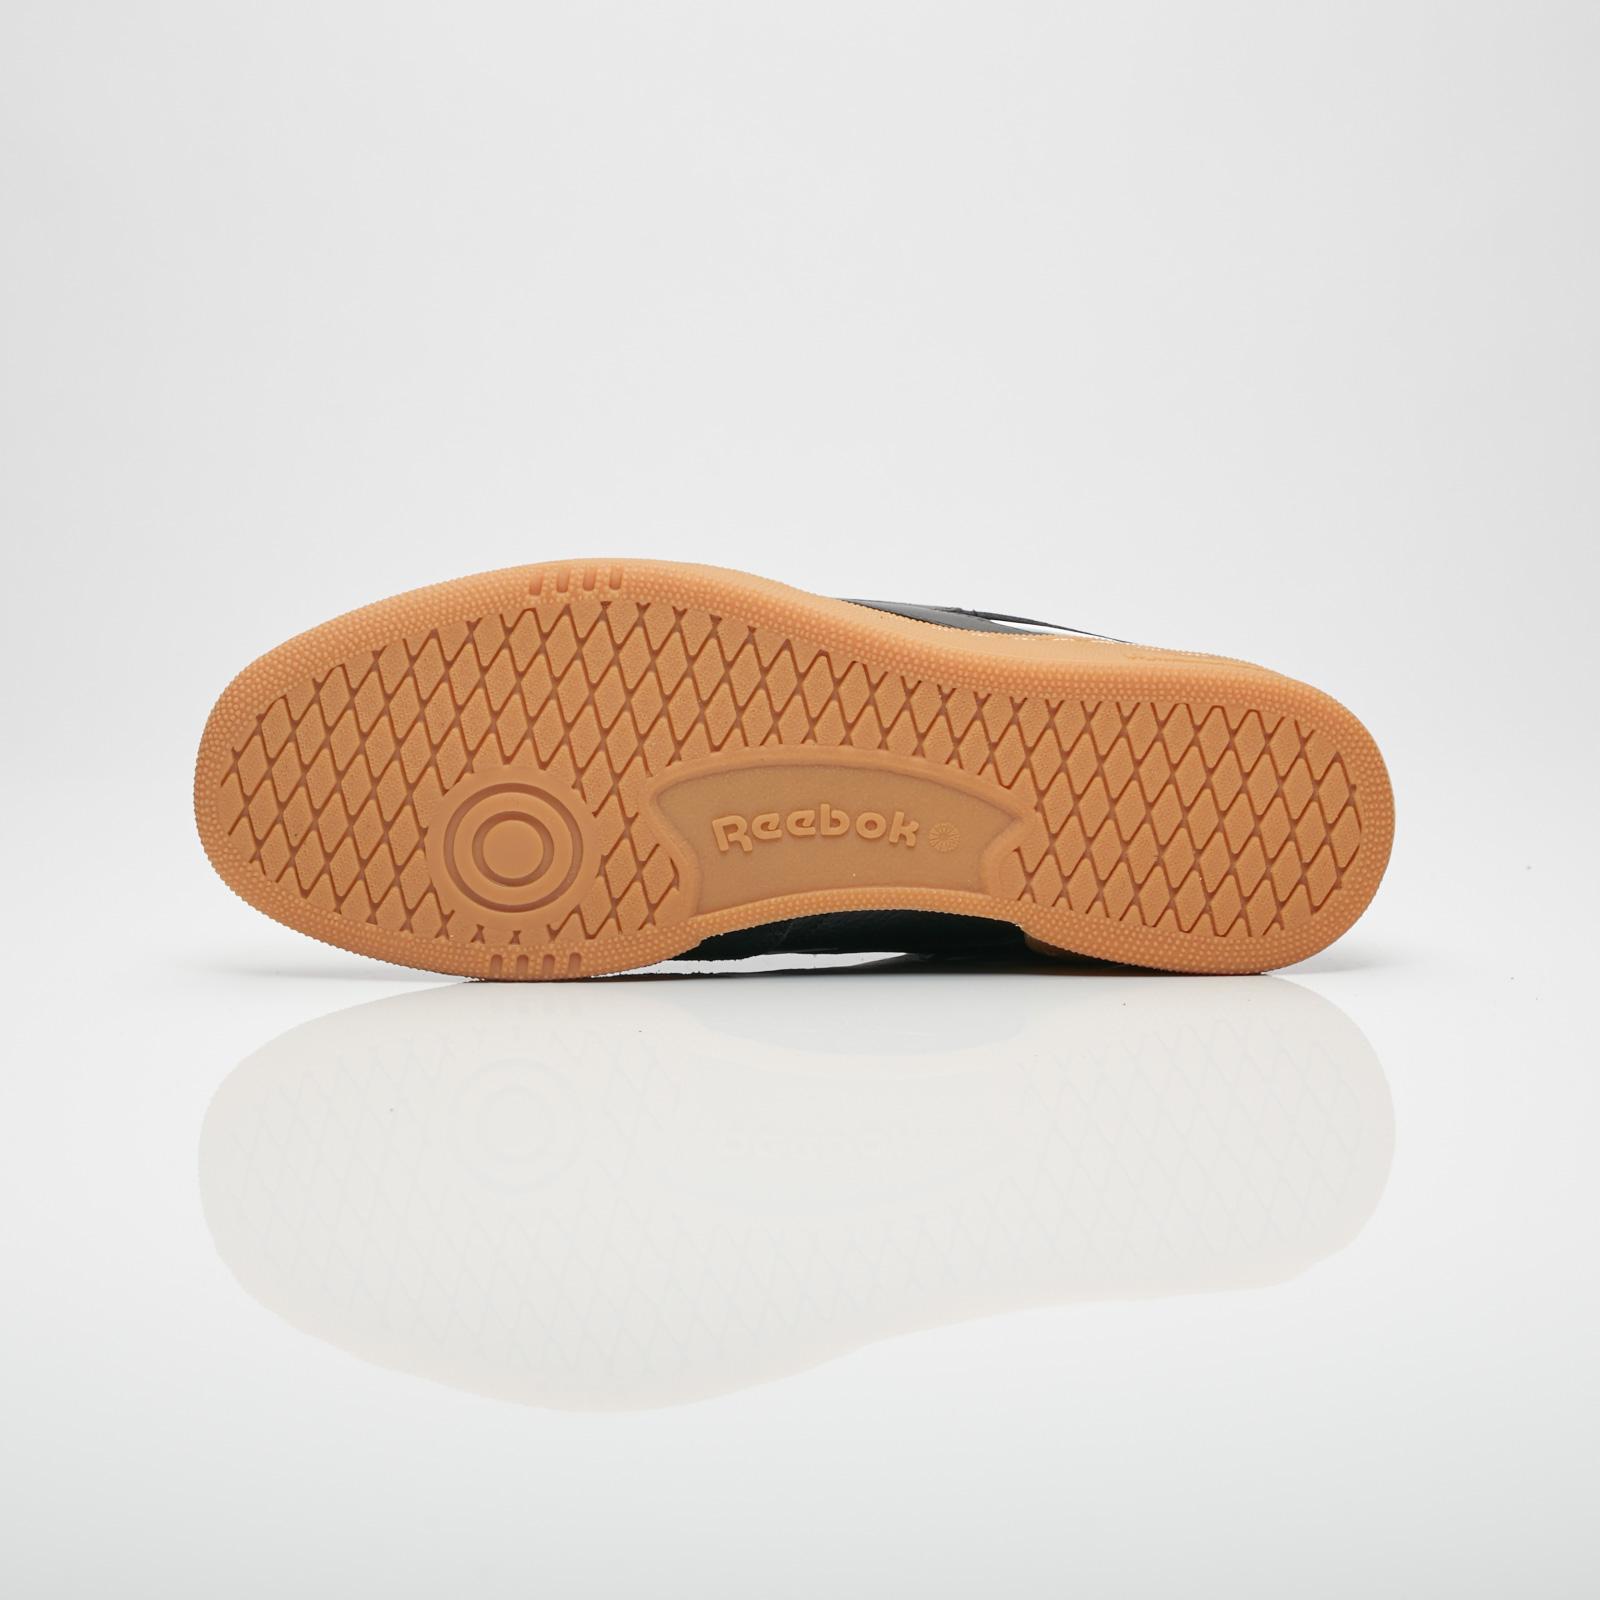 23746f9d5dae8a Reebok Revenge Plus Gum - Cm8790 - Sneakersnstuff